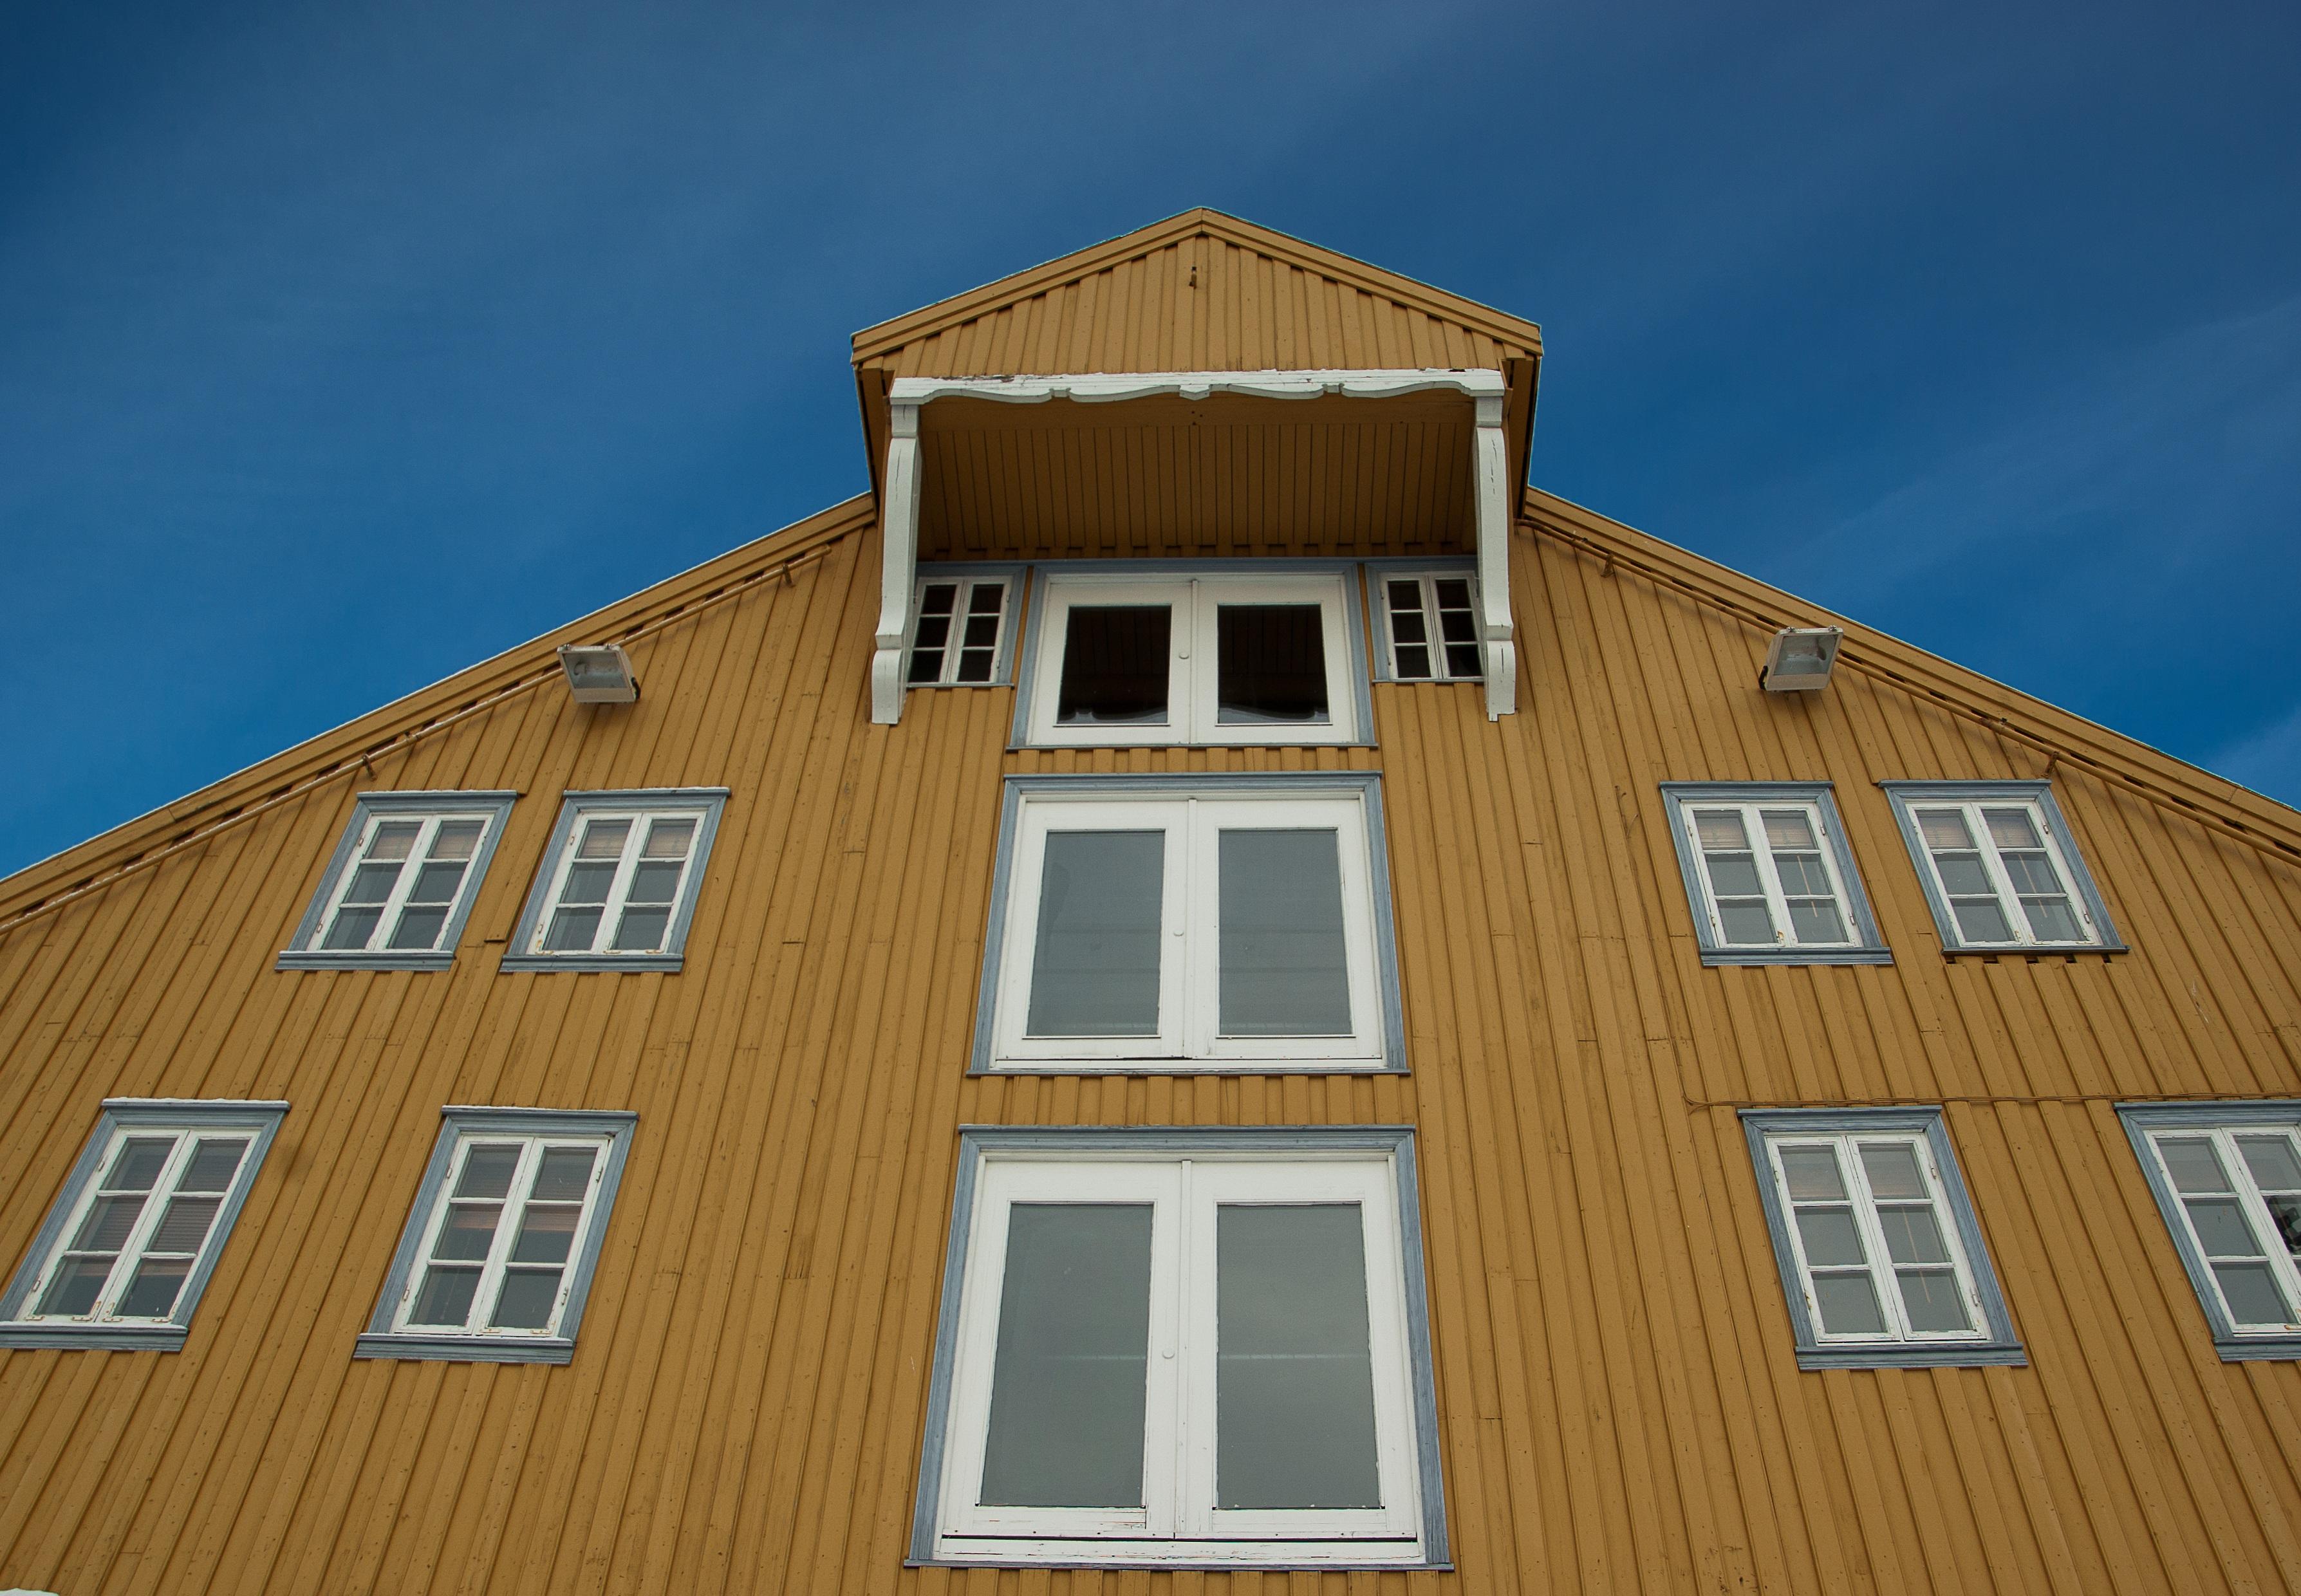 Maison en bois finlandaise stunning maison en bois for Maison en bois finlandaise